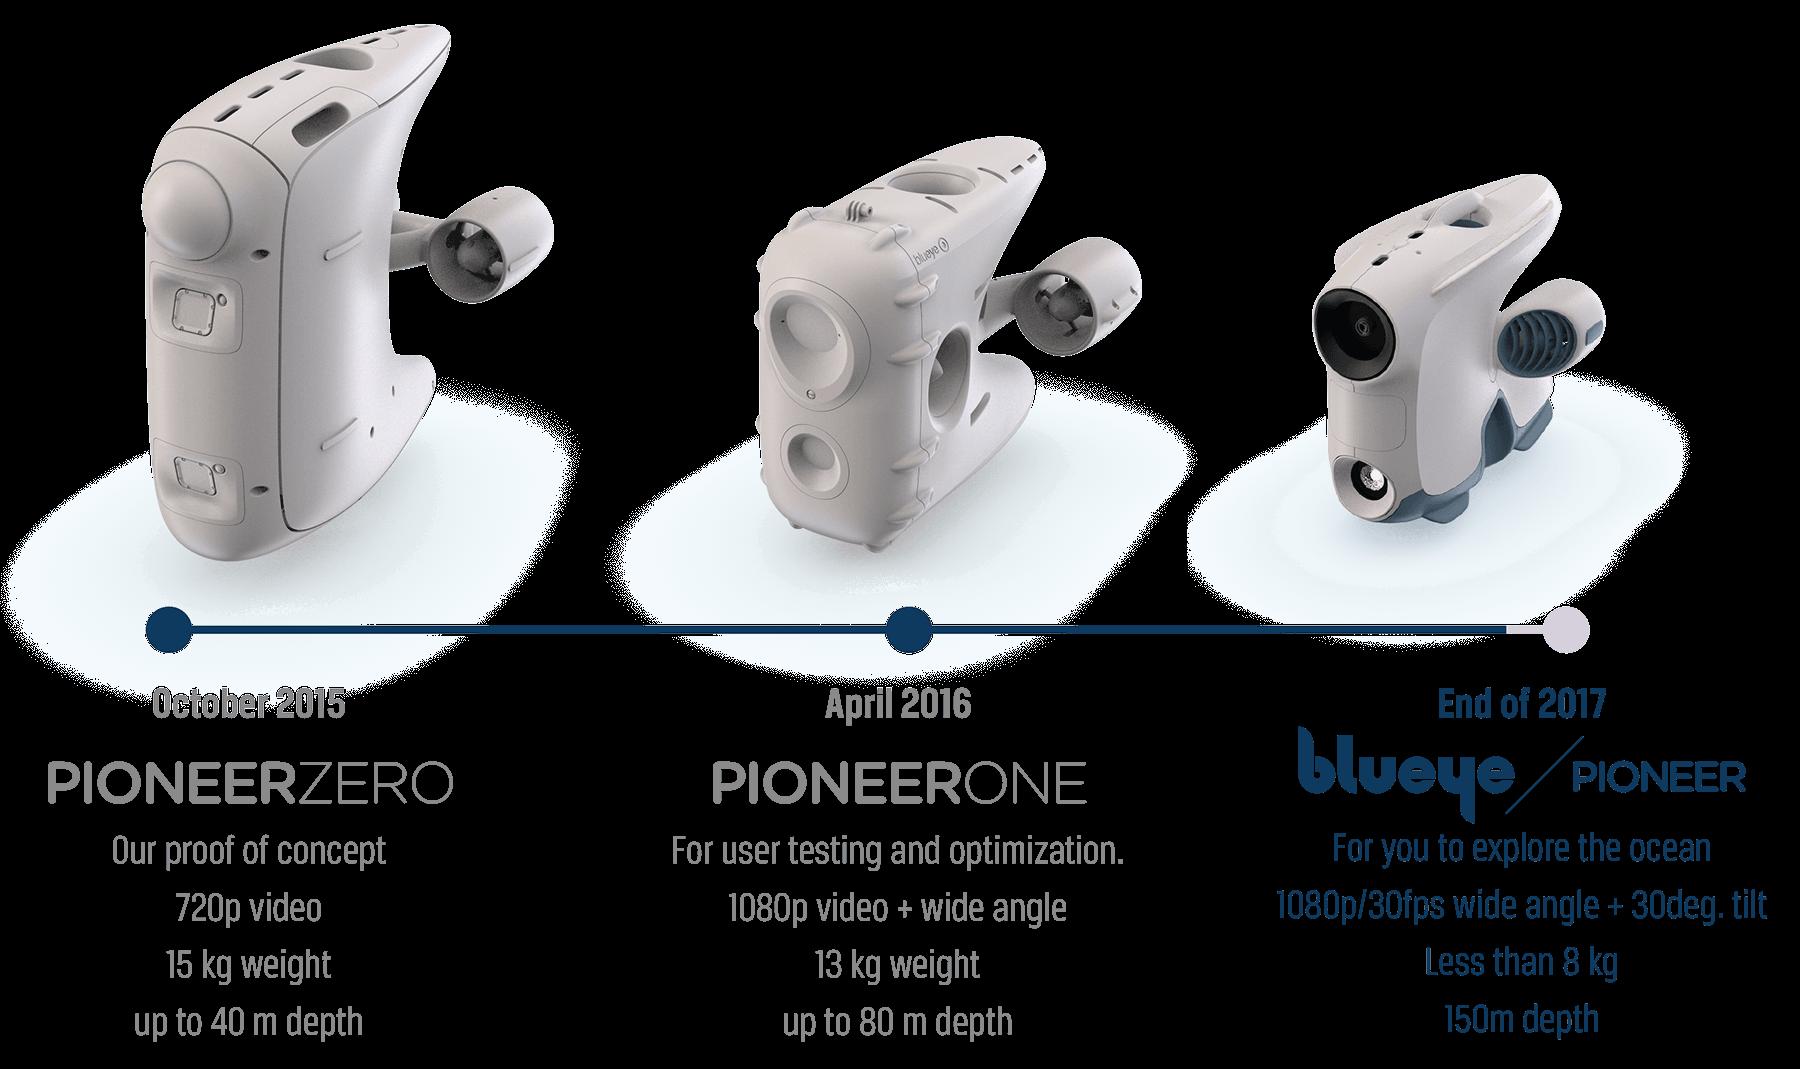 The progress of the Pioneer